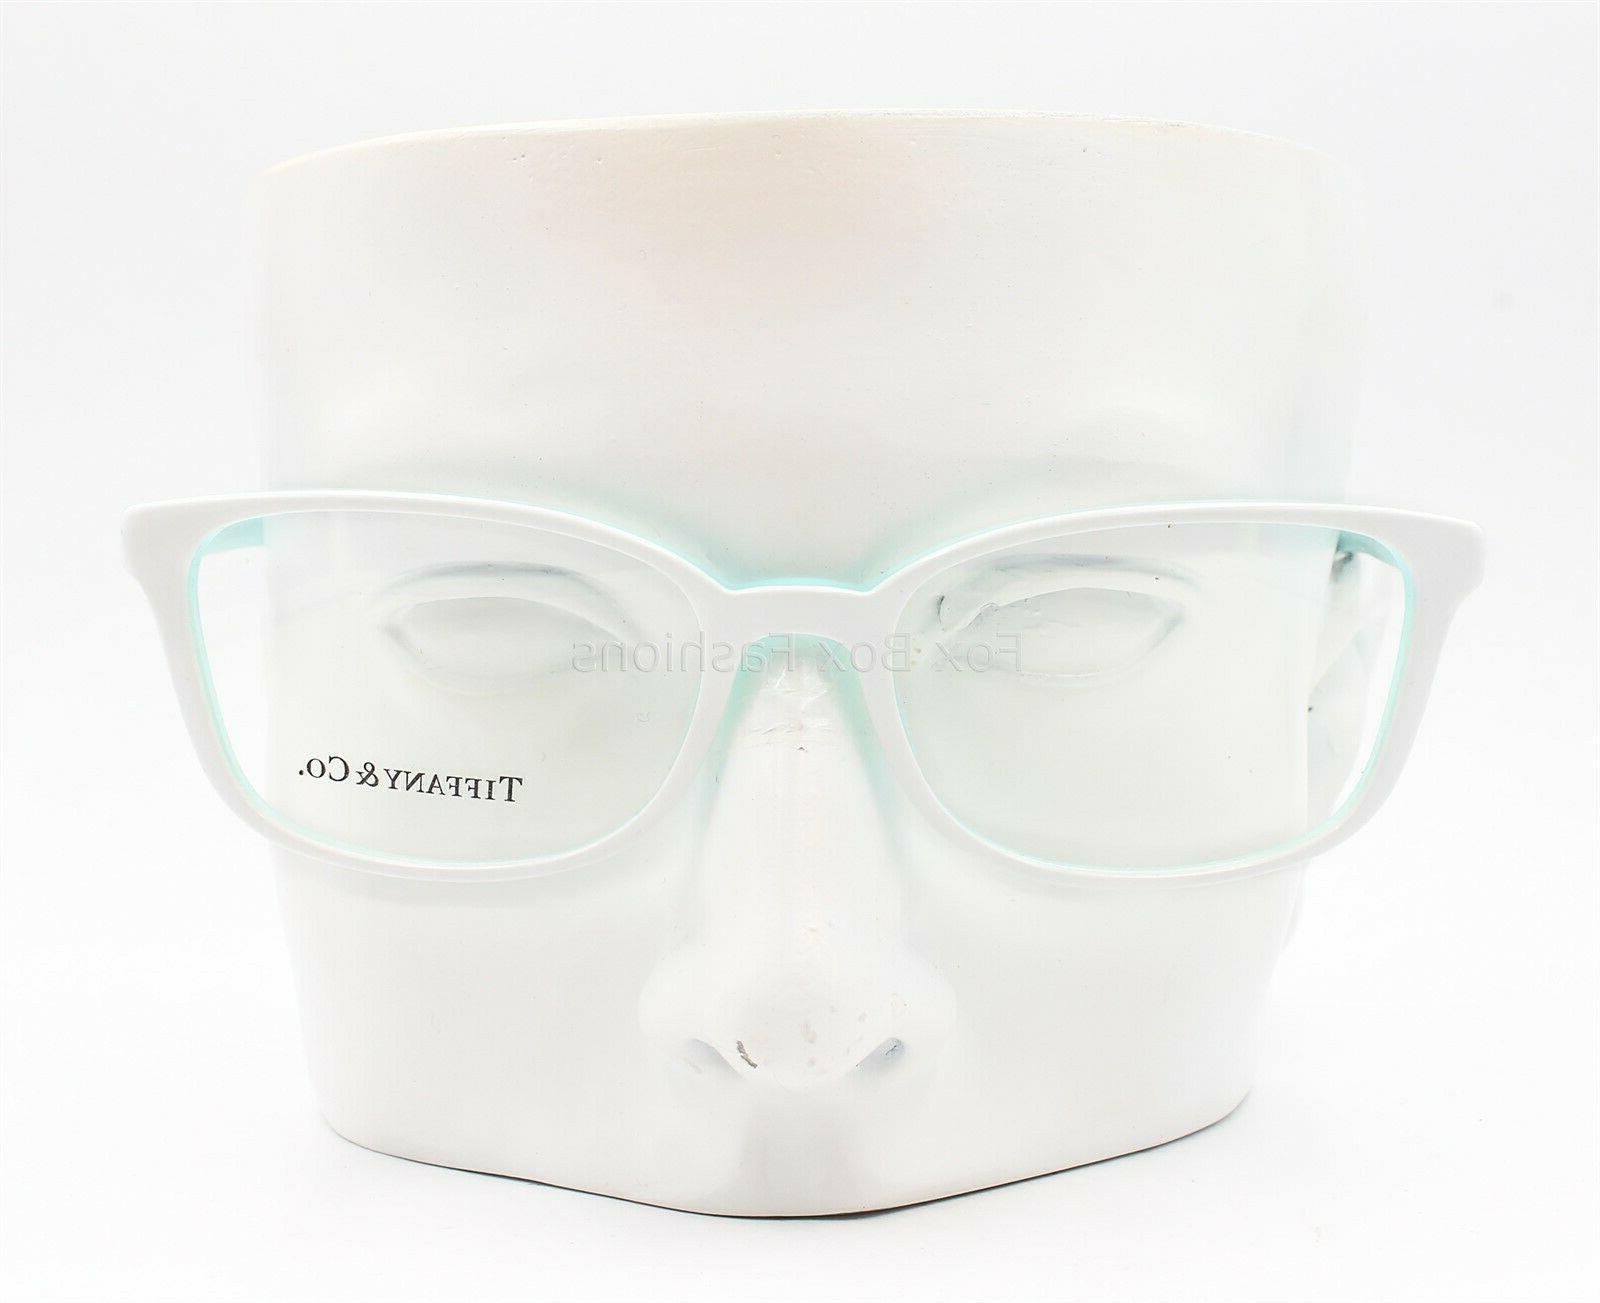 Tiffany & 2094 Eyeglasses Glasses White Blue Display